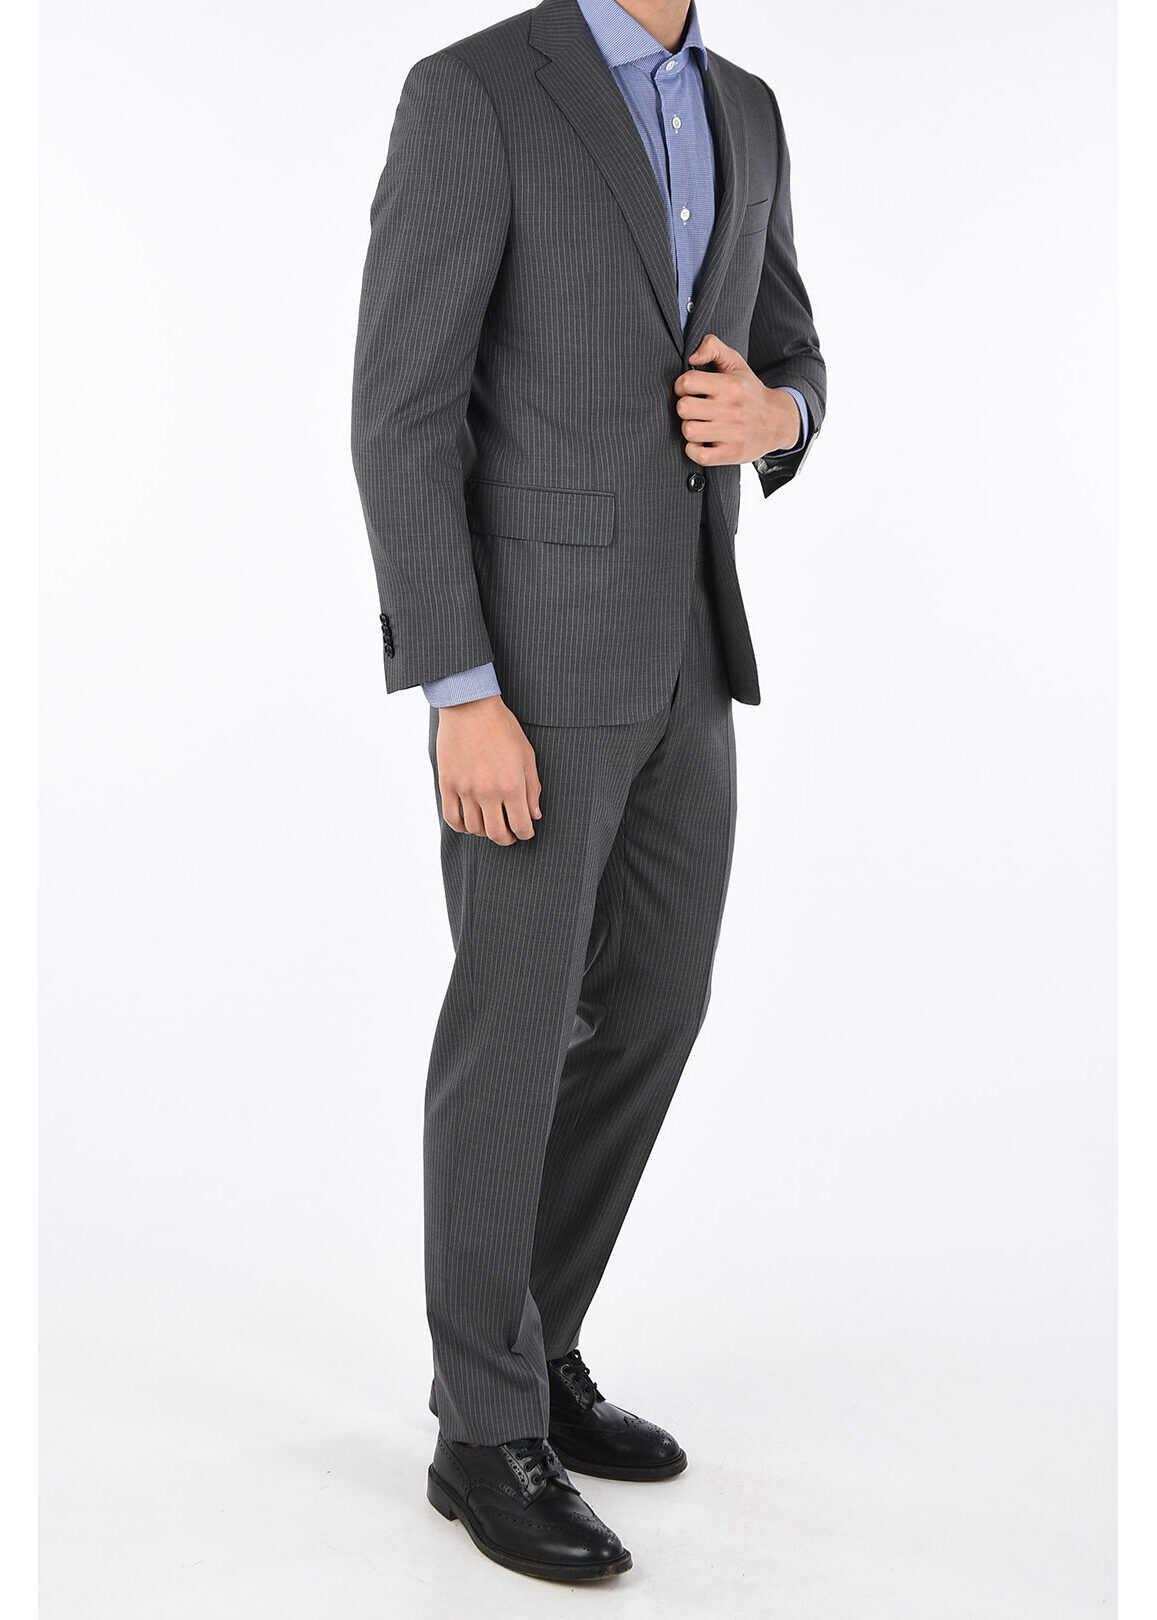 CORNELIANI notch lapel pinstriped MATUA 2-button suit GRAY imagine